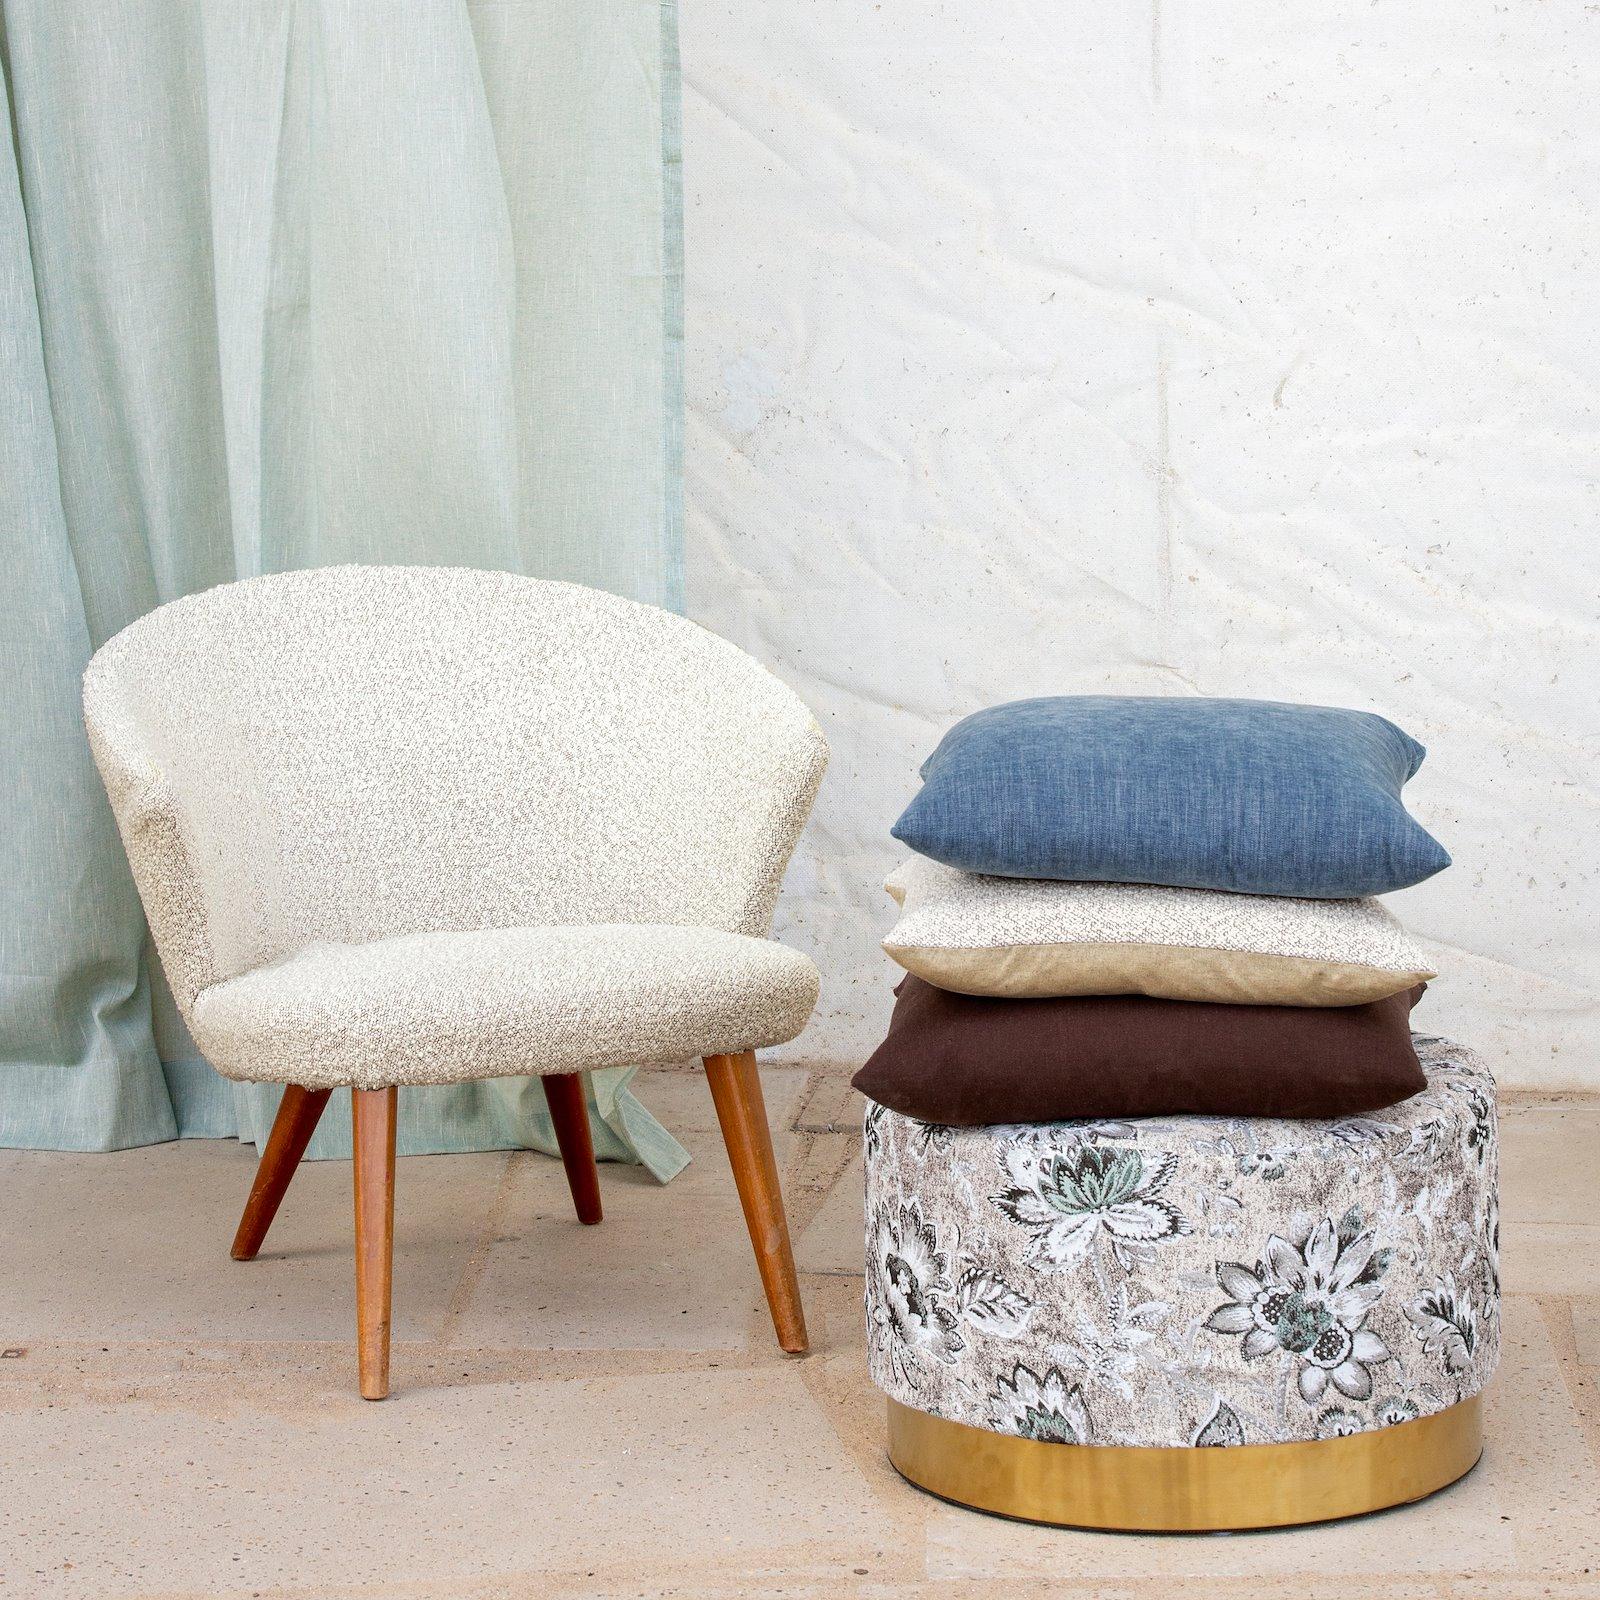 Upholstery boucle offwhite/putty melange 824161_824169_824160_851962_bundle